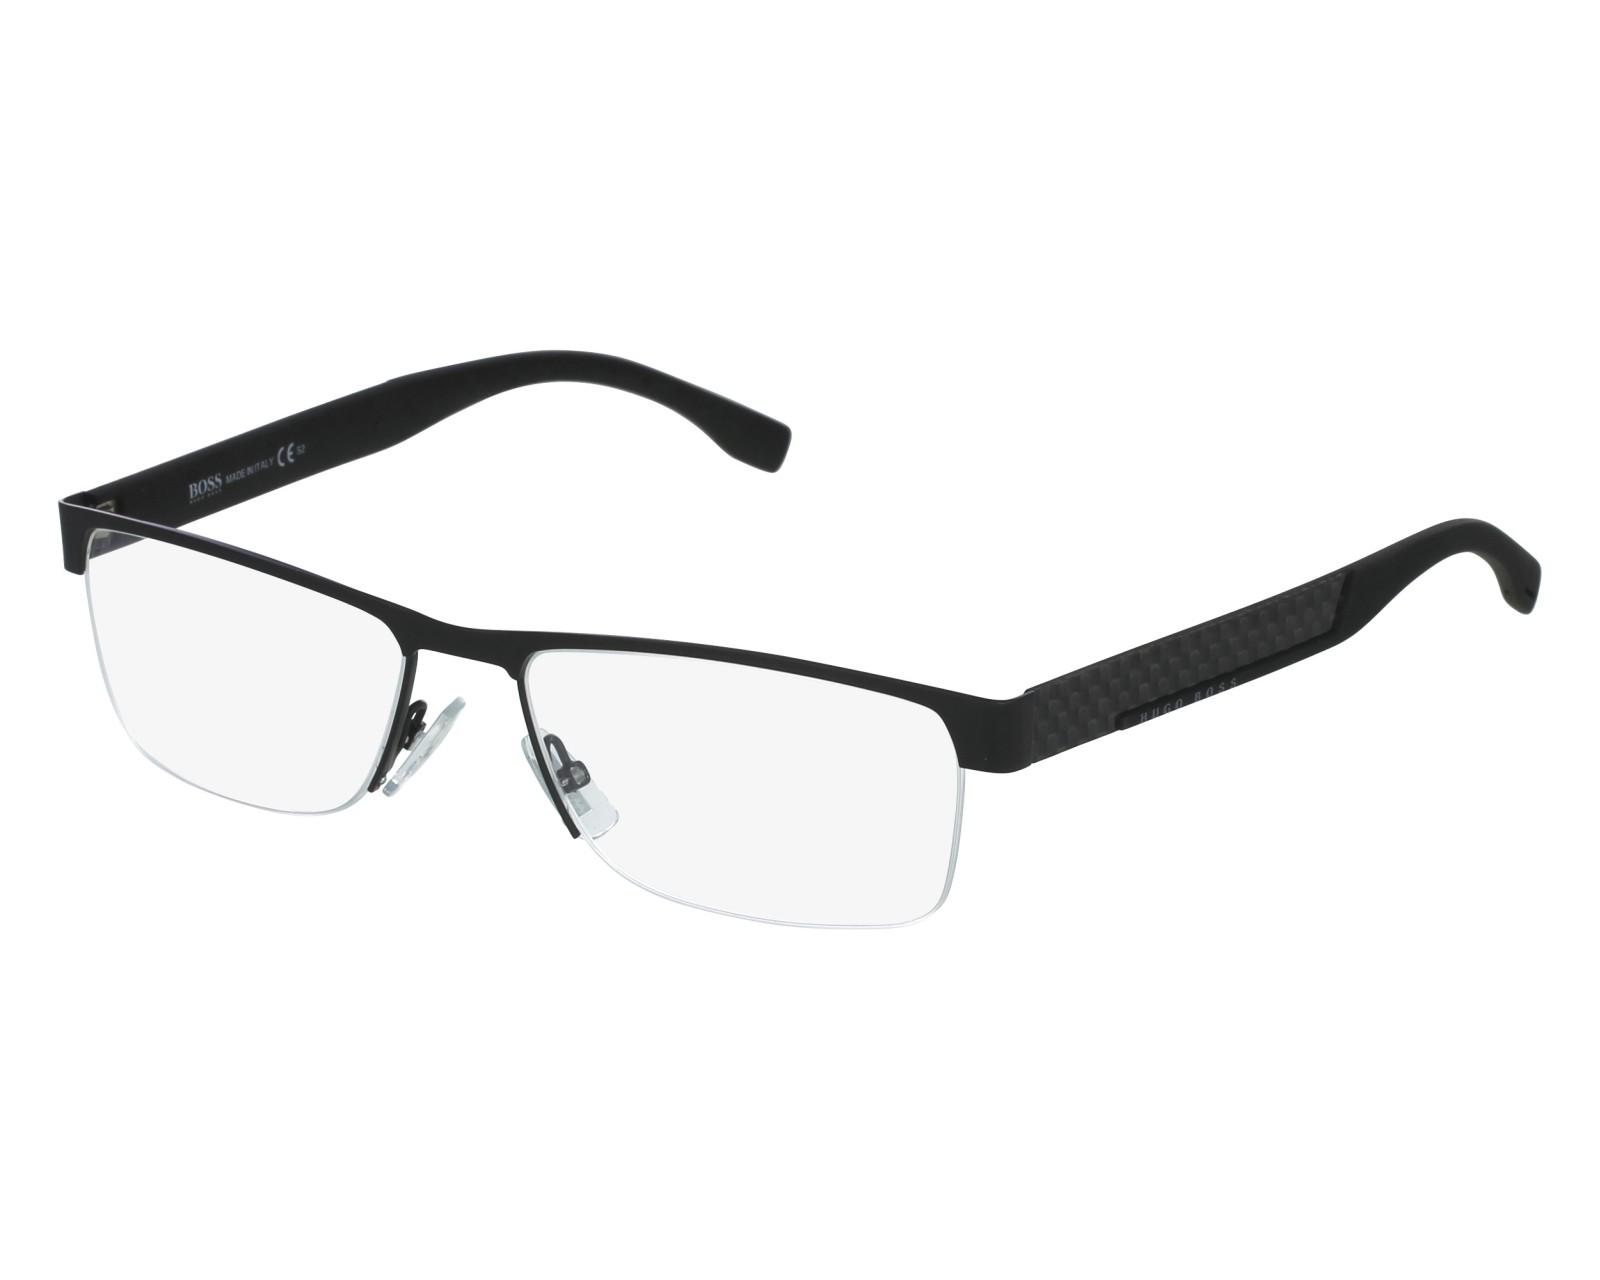 7294cce6a5c eyeglasses Hugo Boss BOSS-0644 HXJ 56-17 Black front view